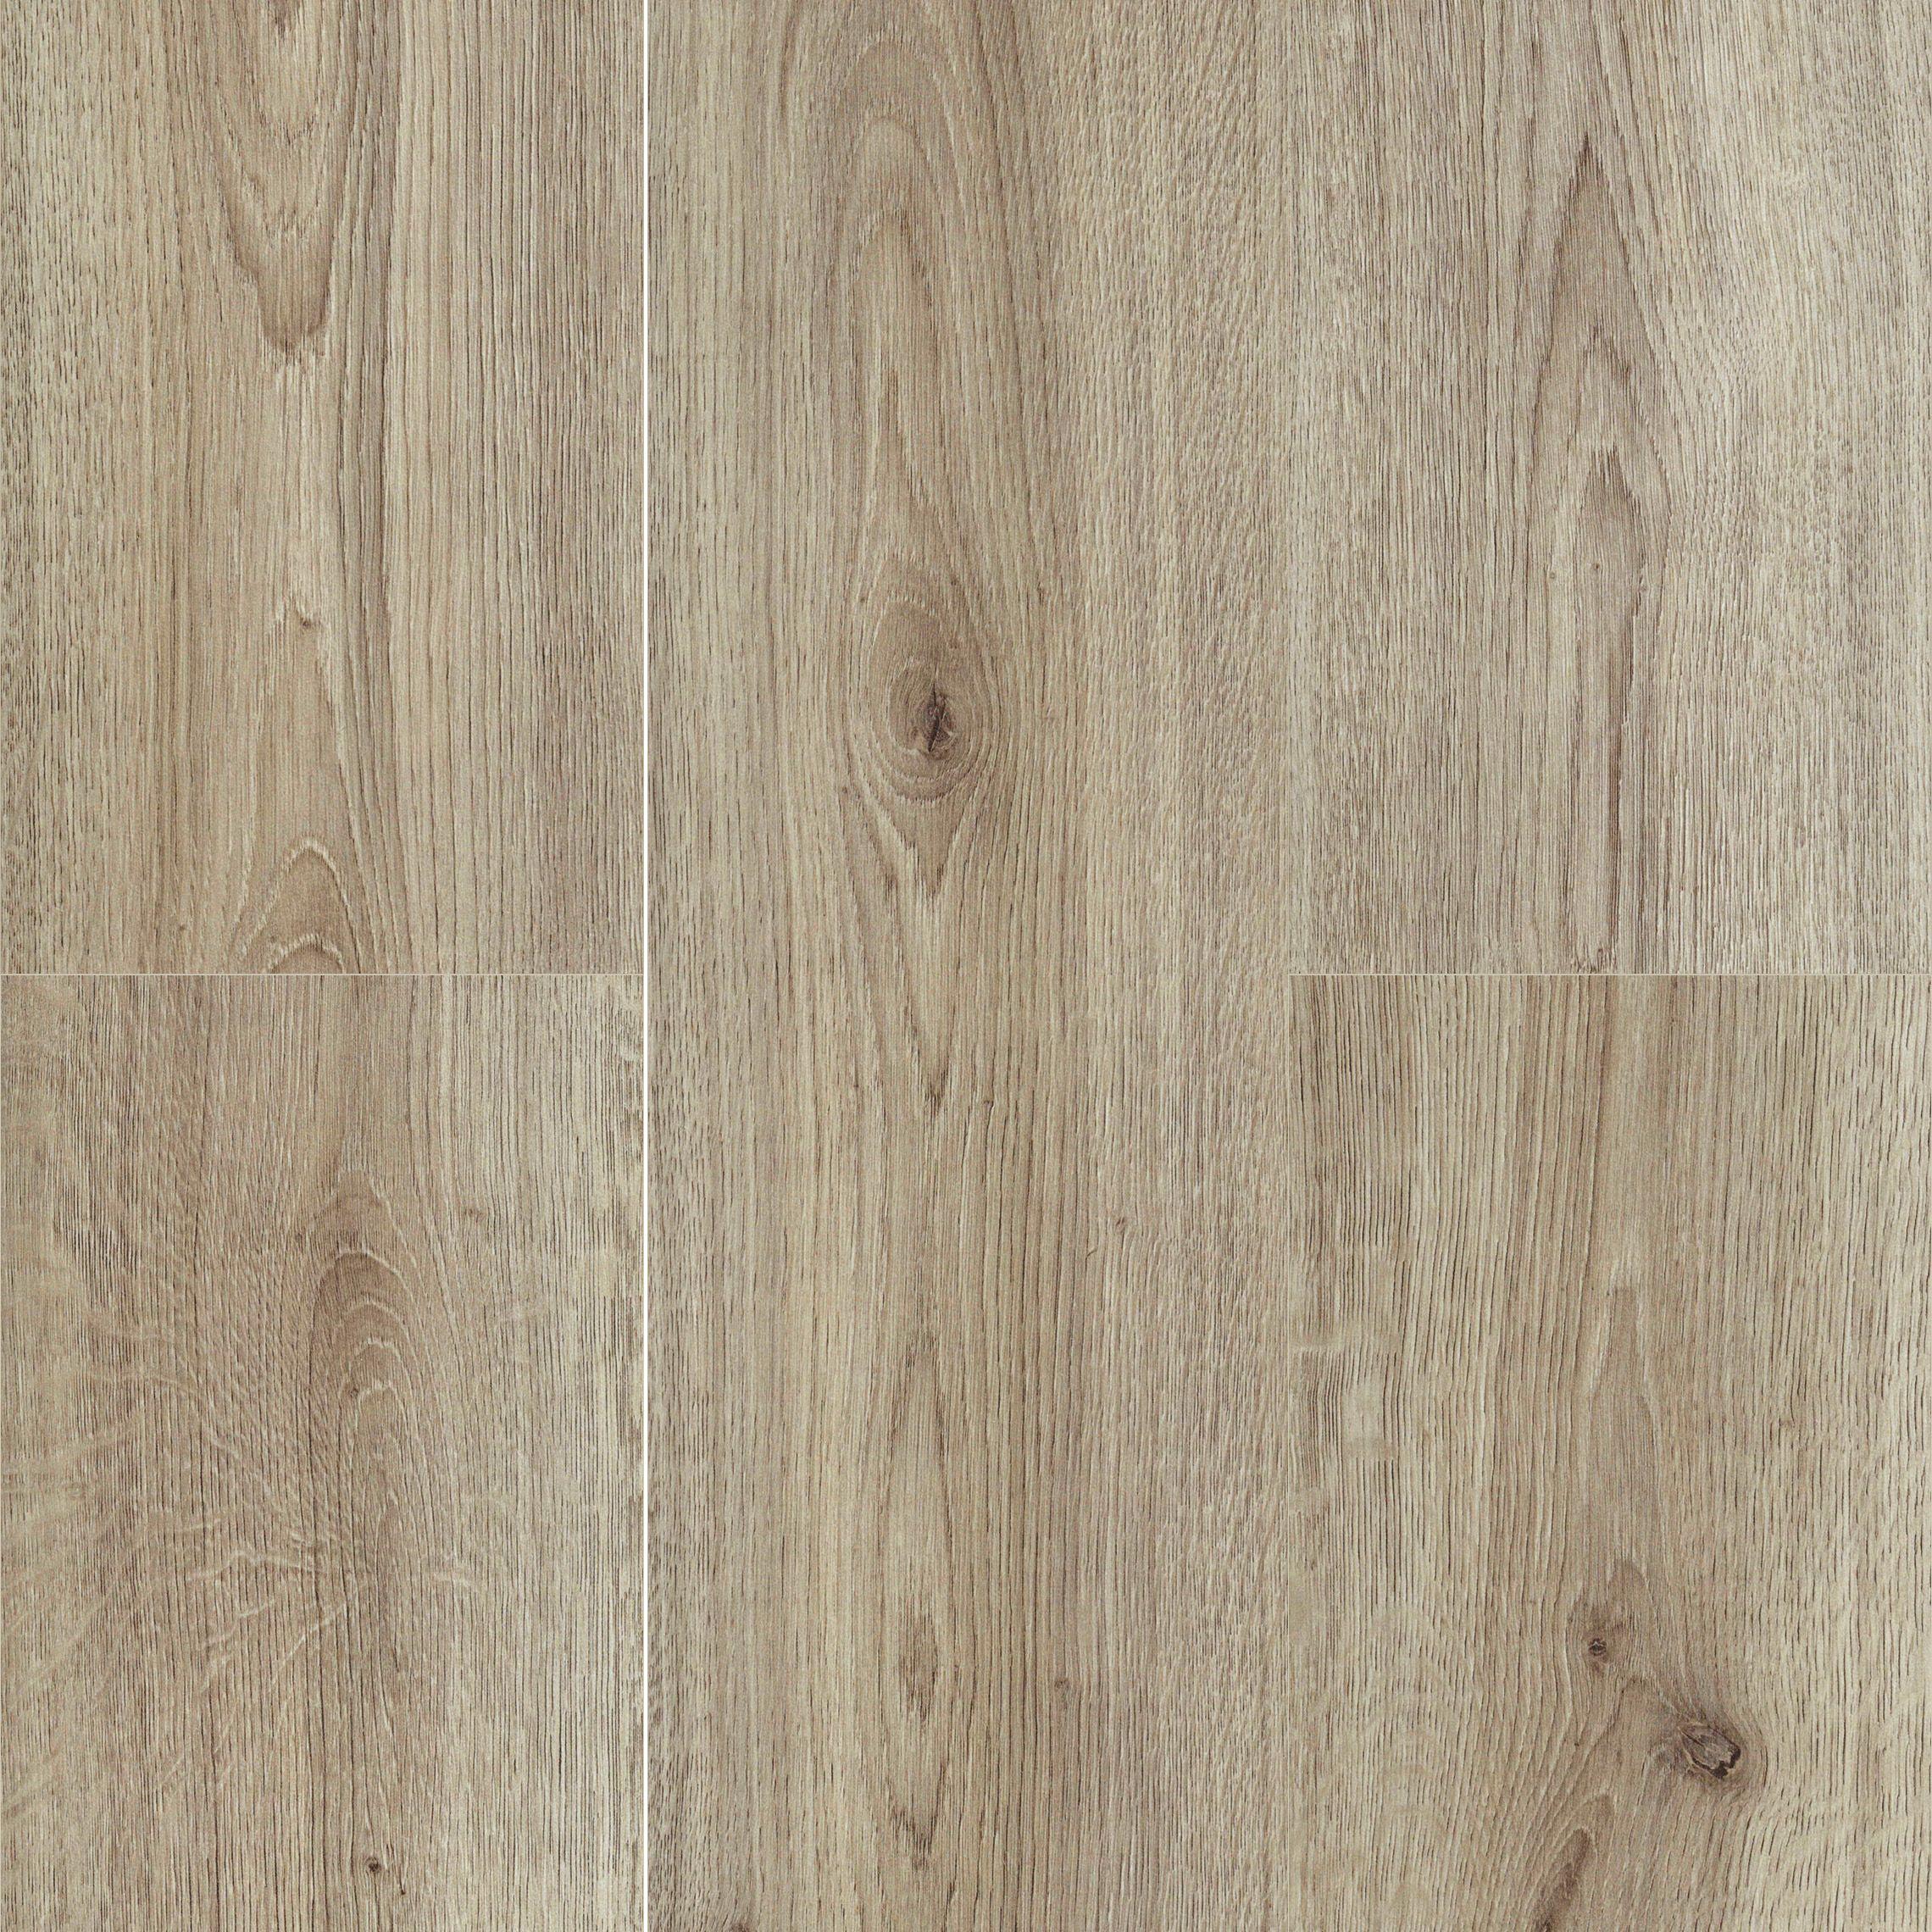 Kronotex Sound Plus Trend Oak Grey Click Together Laminate